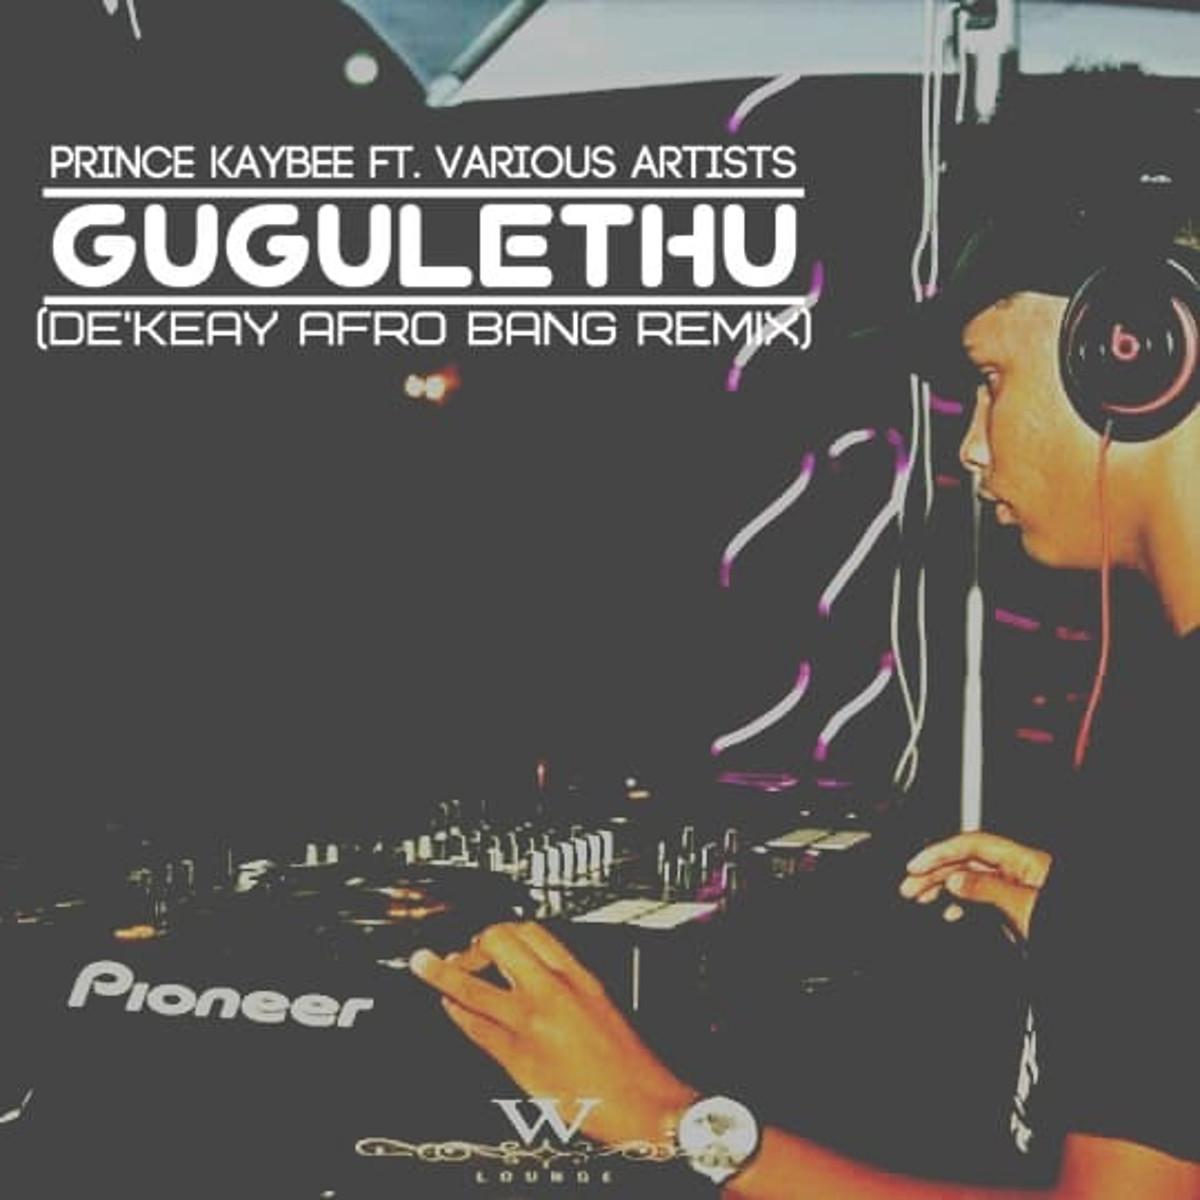 Prince Kaybee - Gugulethu (De'KeaY Afro Bang Mix)